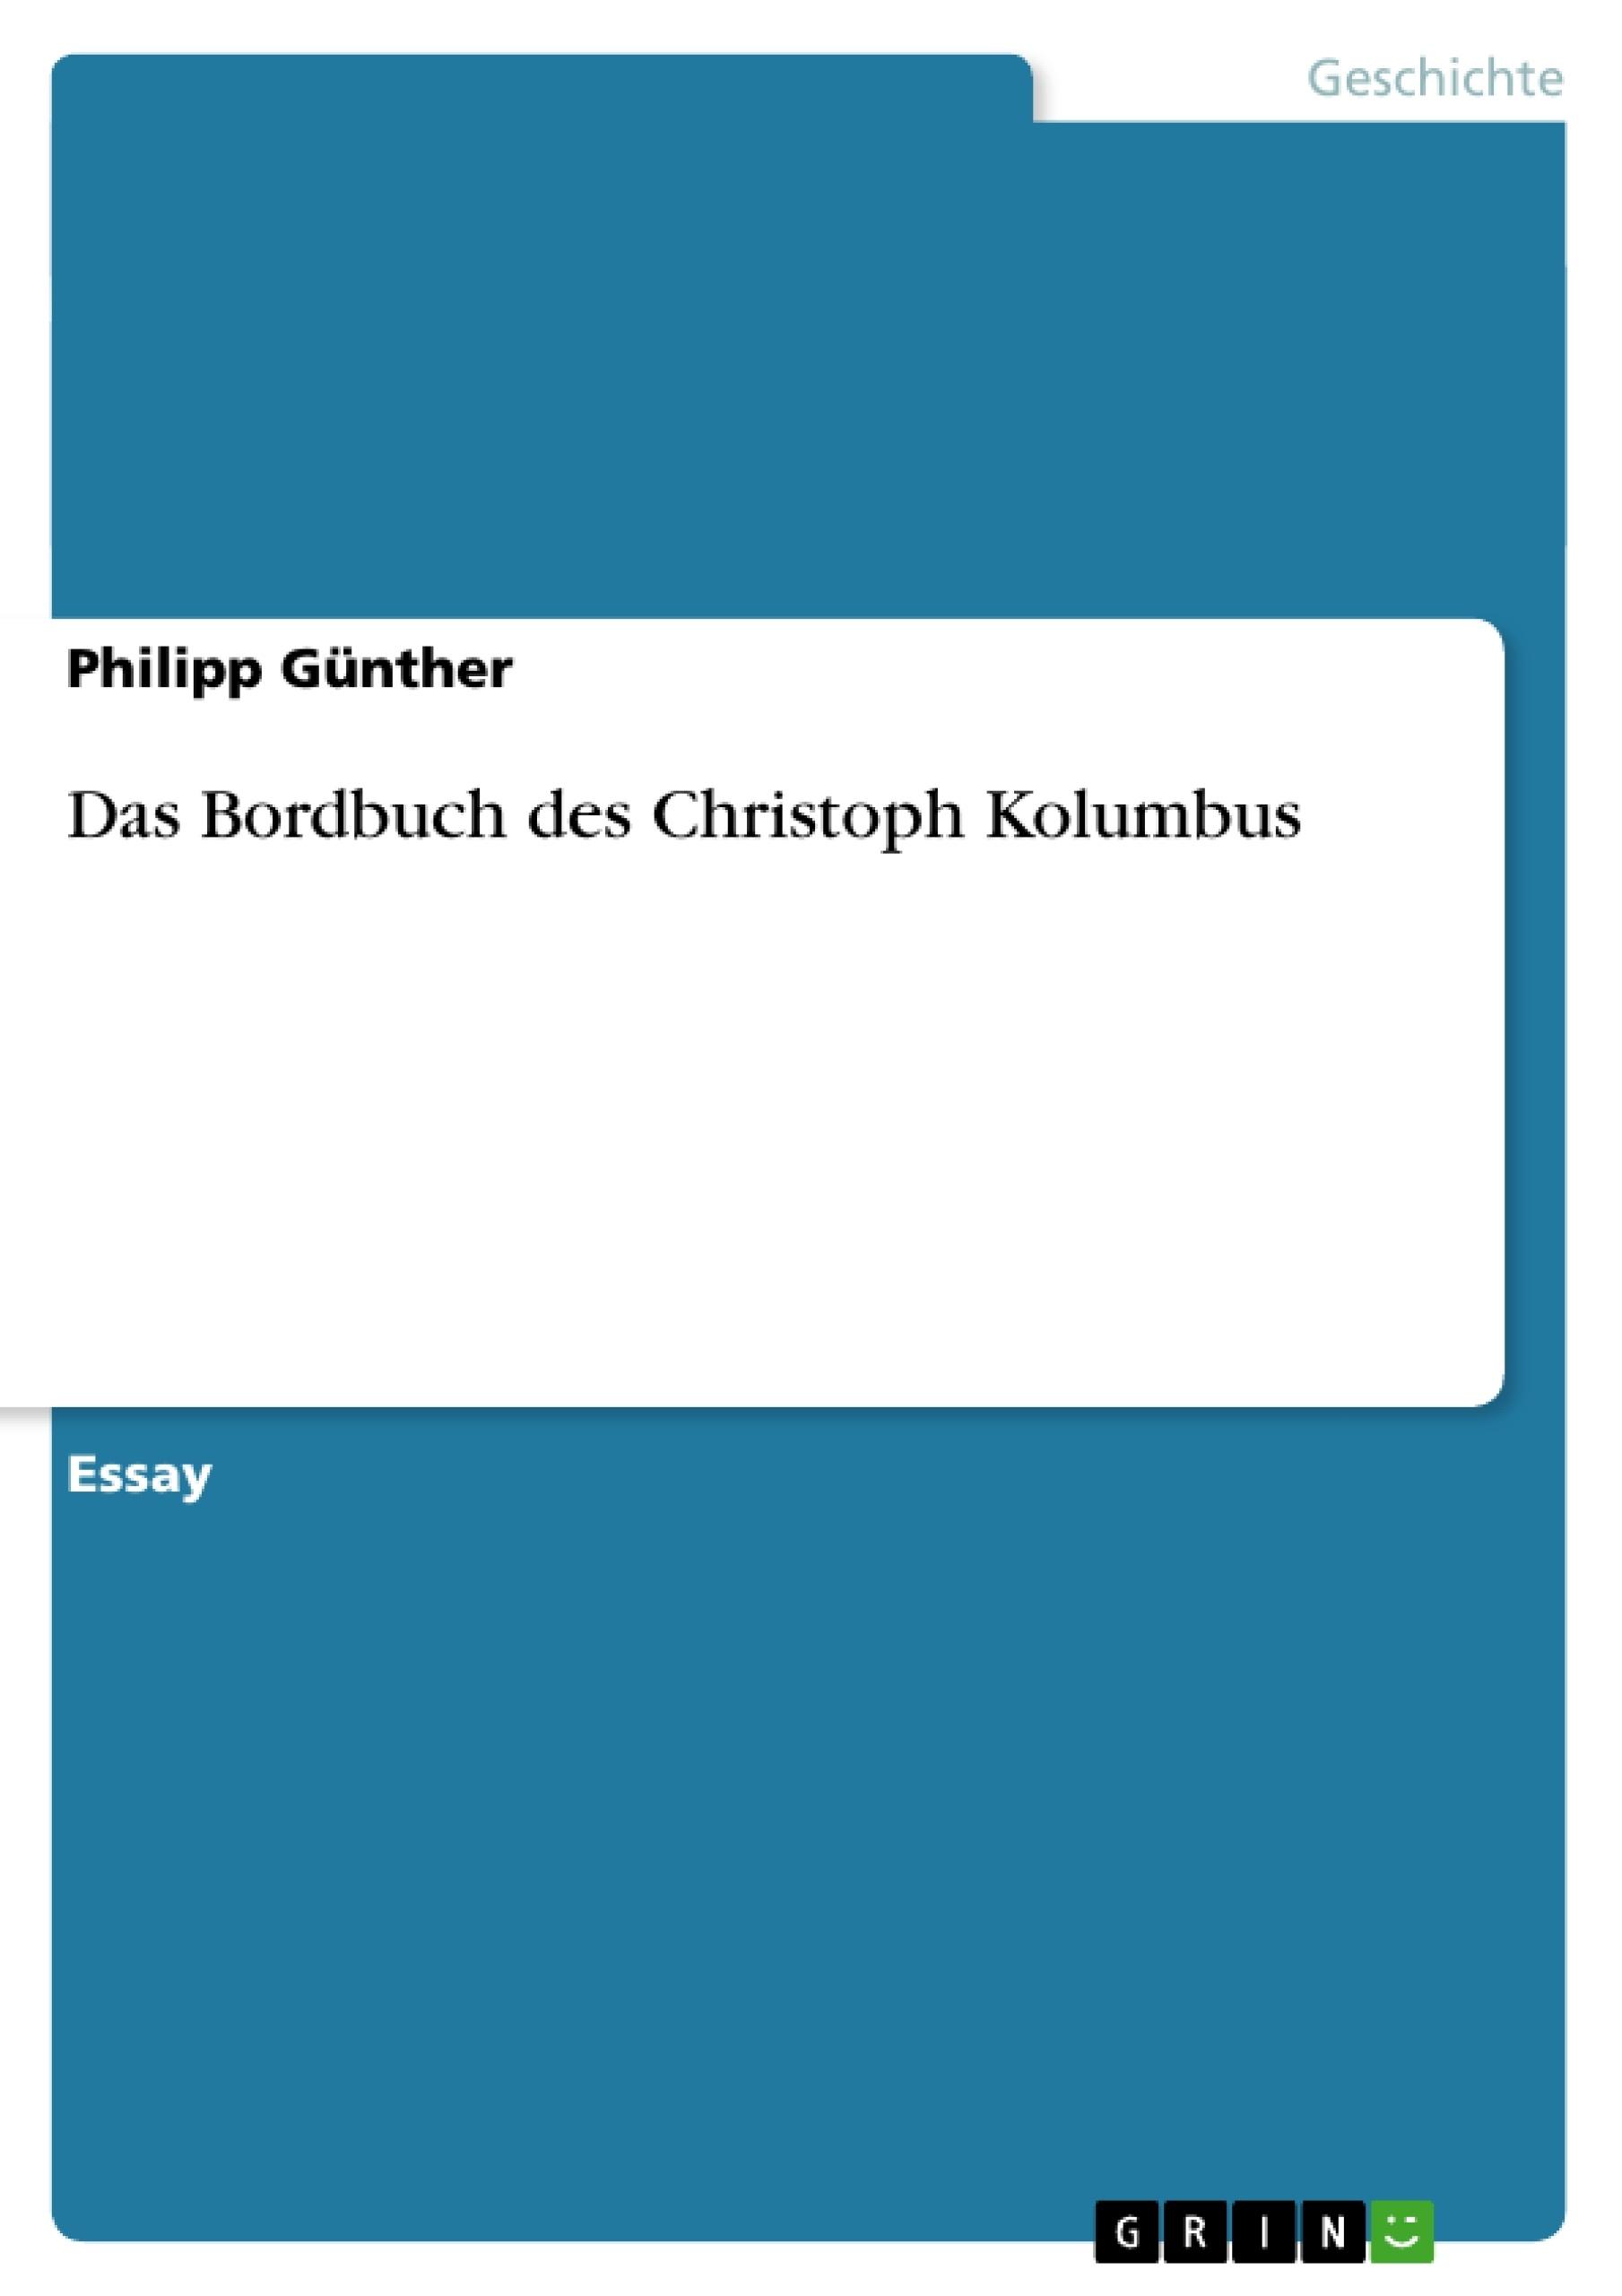 Titel: Das Bordbuch des Christoph Kolumbus